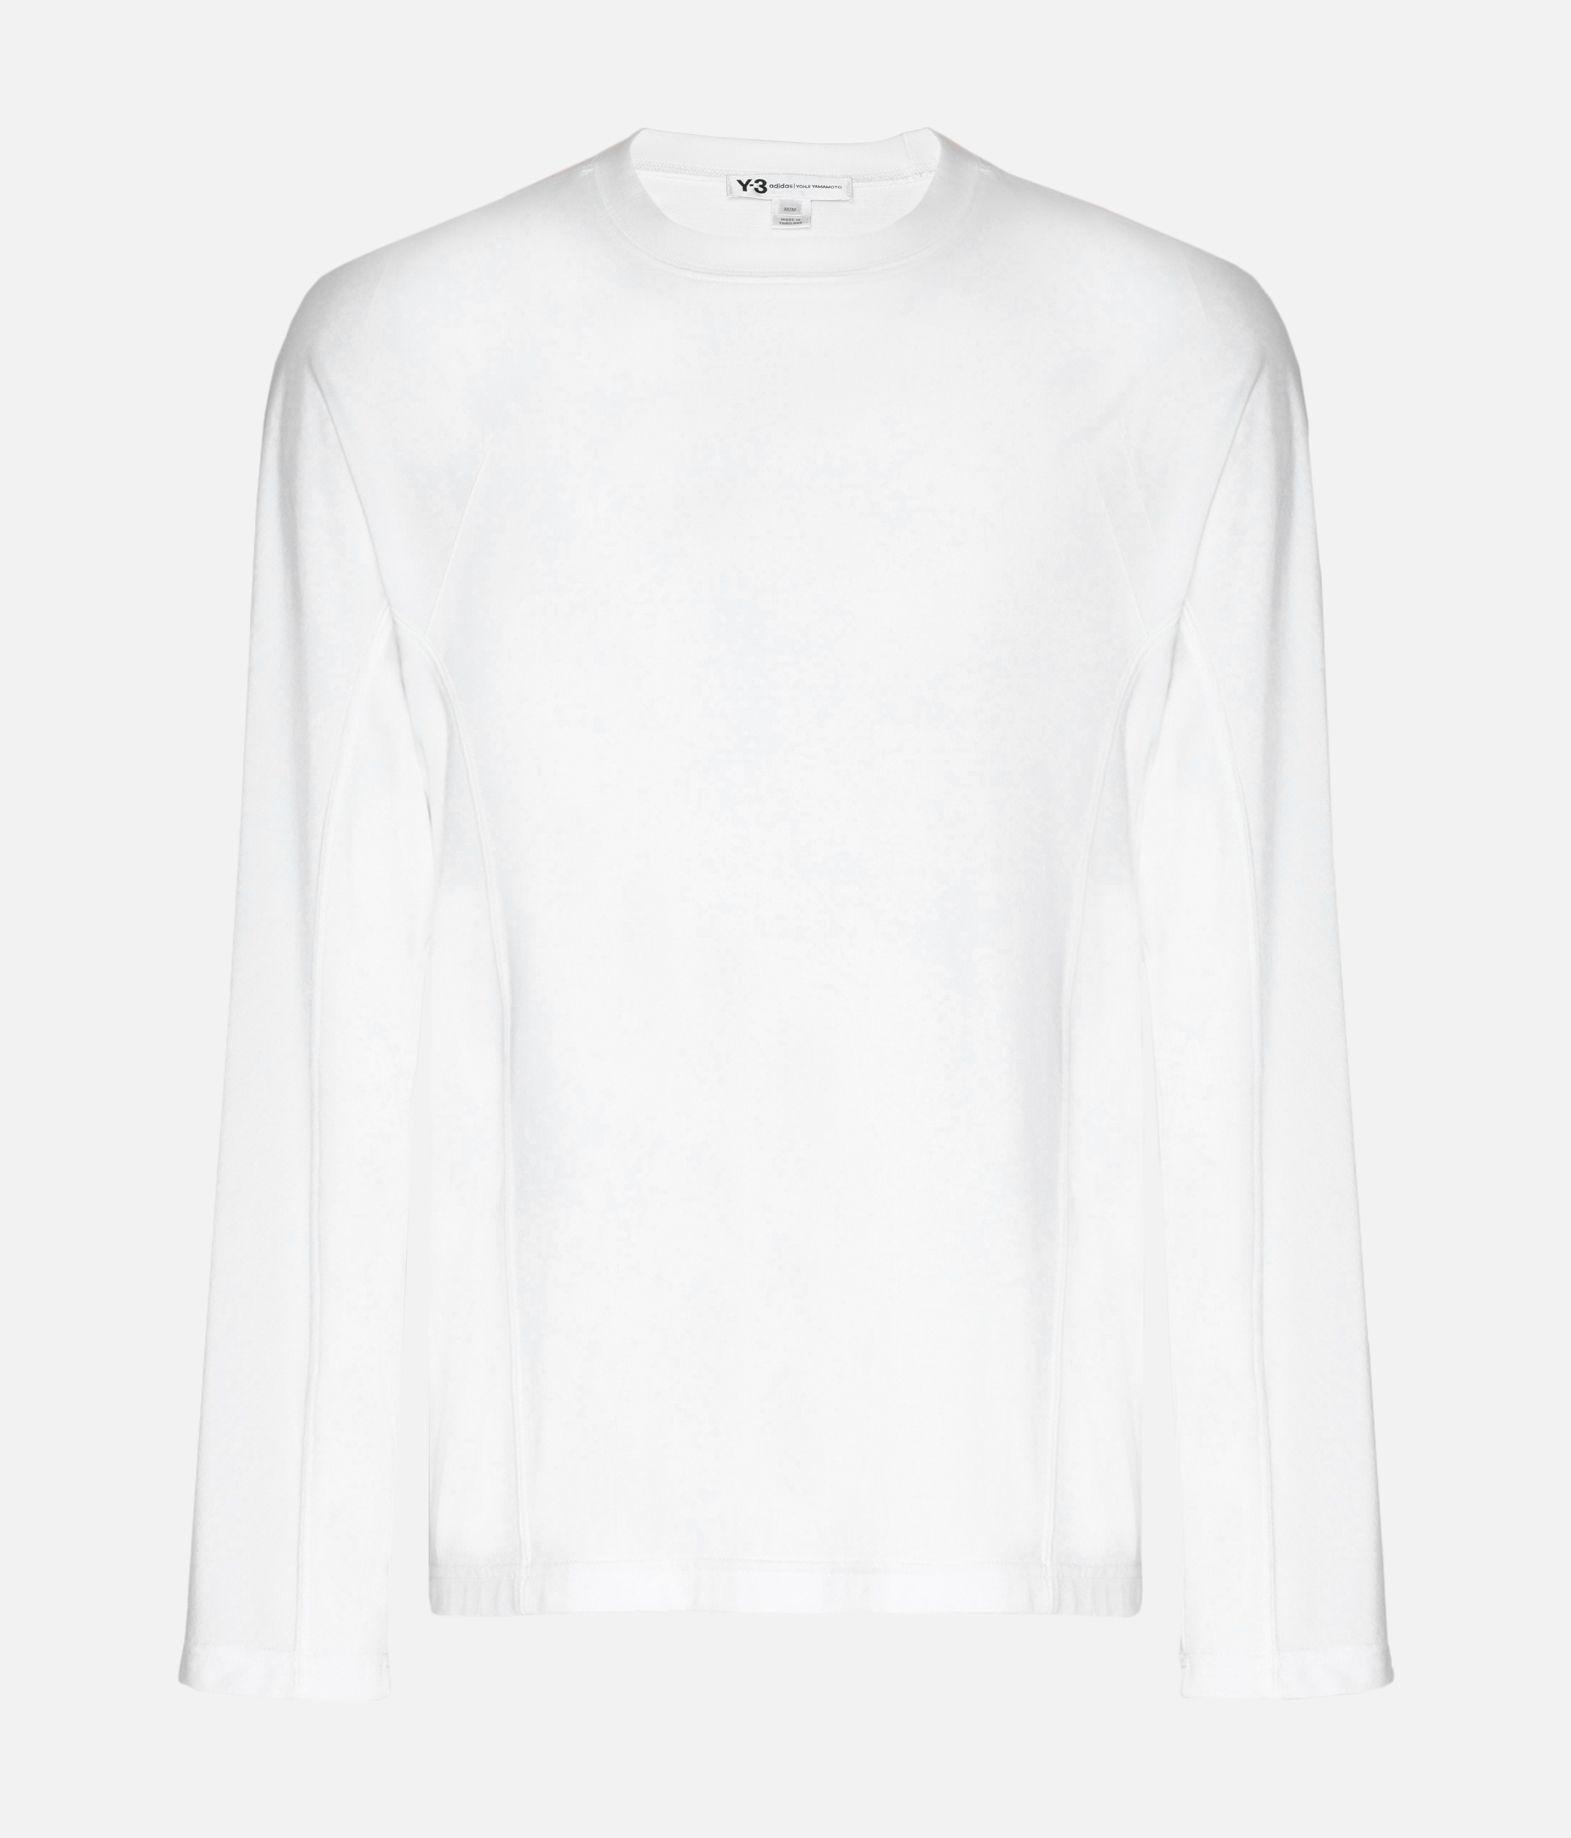 Y-3 Y-3 Classic Tee Langärmliges T-shirt Herren f